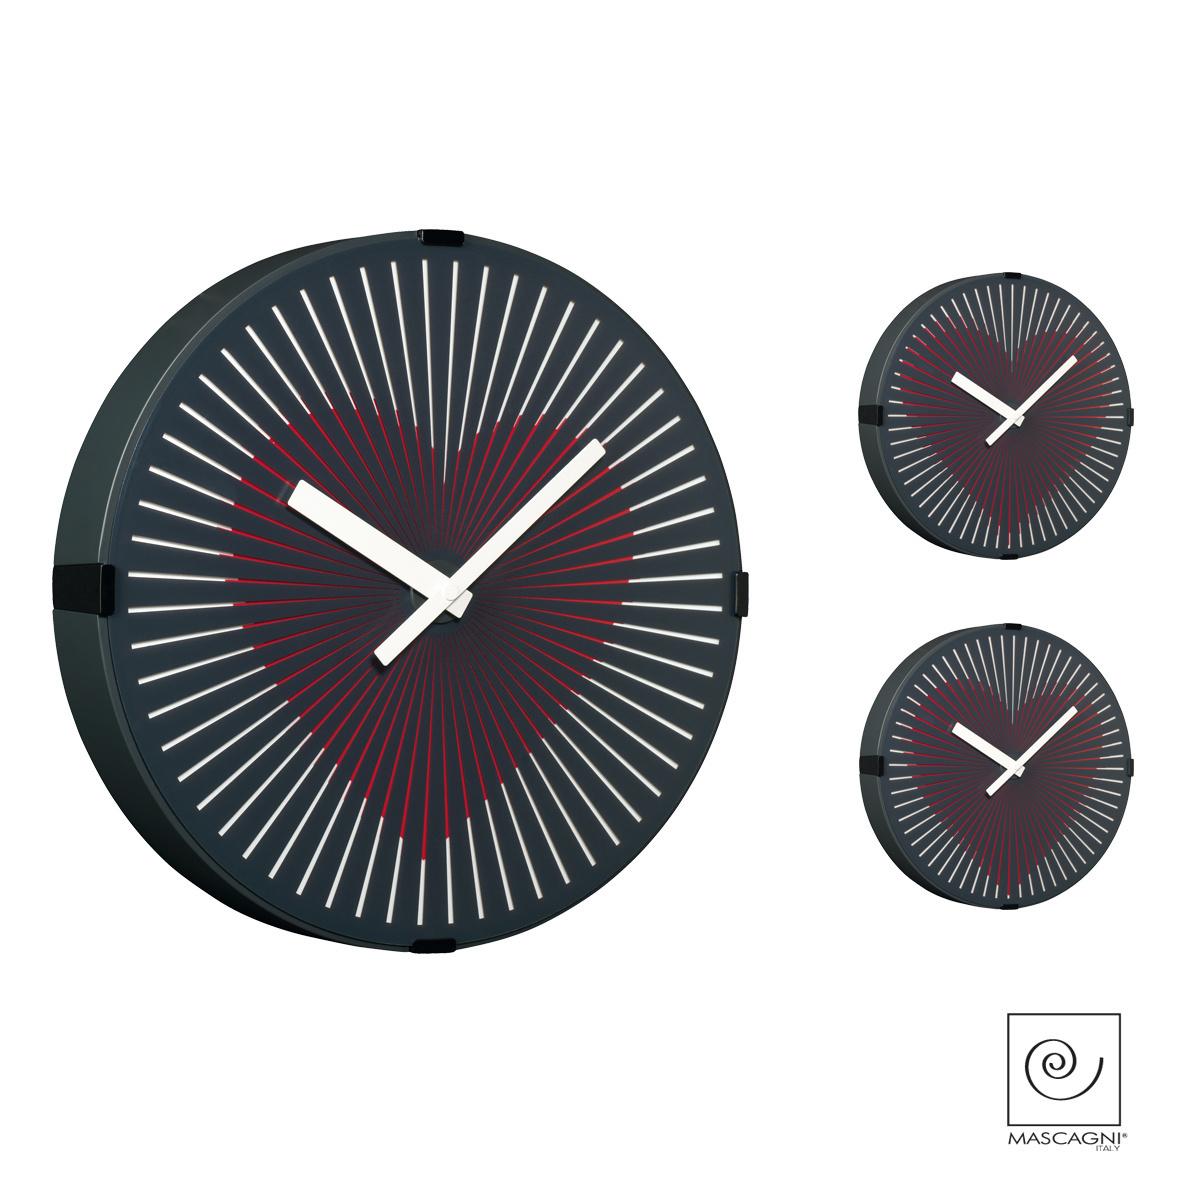 Art Mascagni PULSE CLOCK DIAM.30